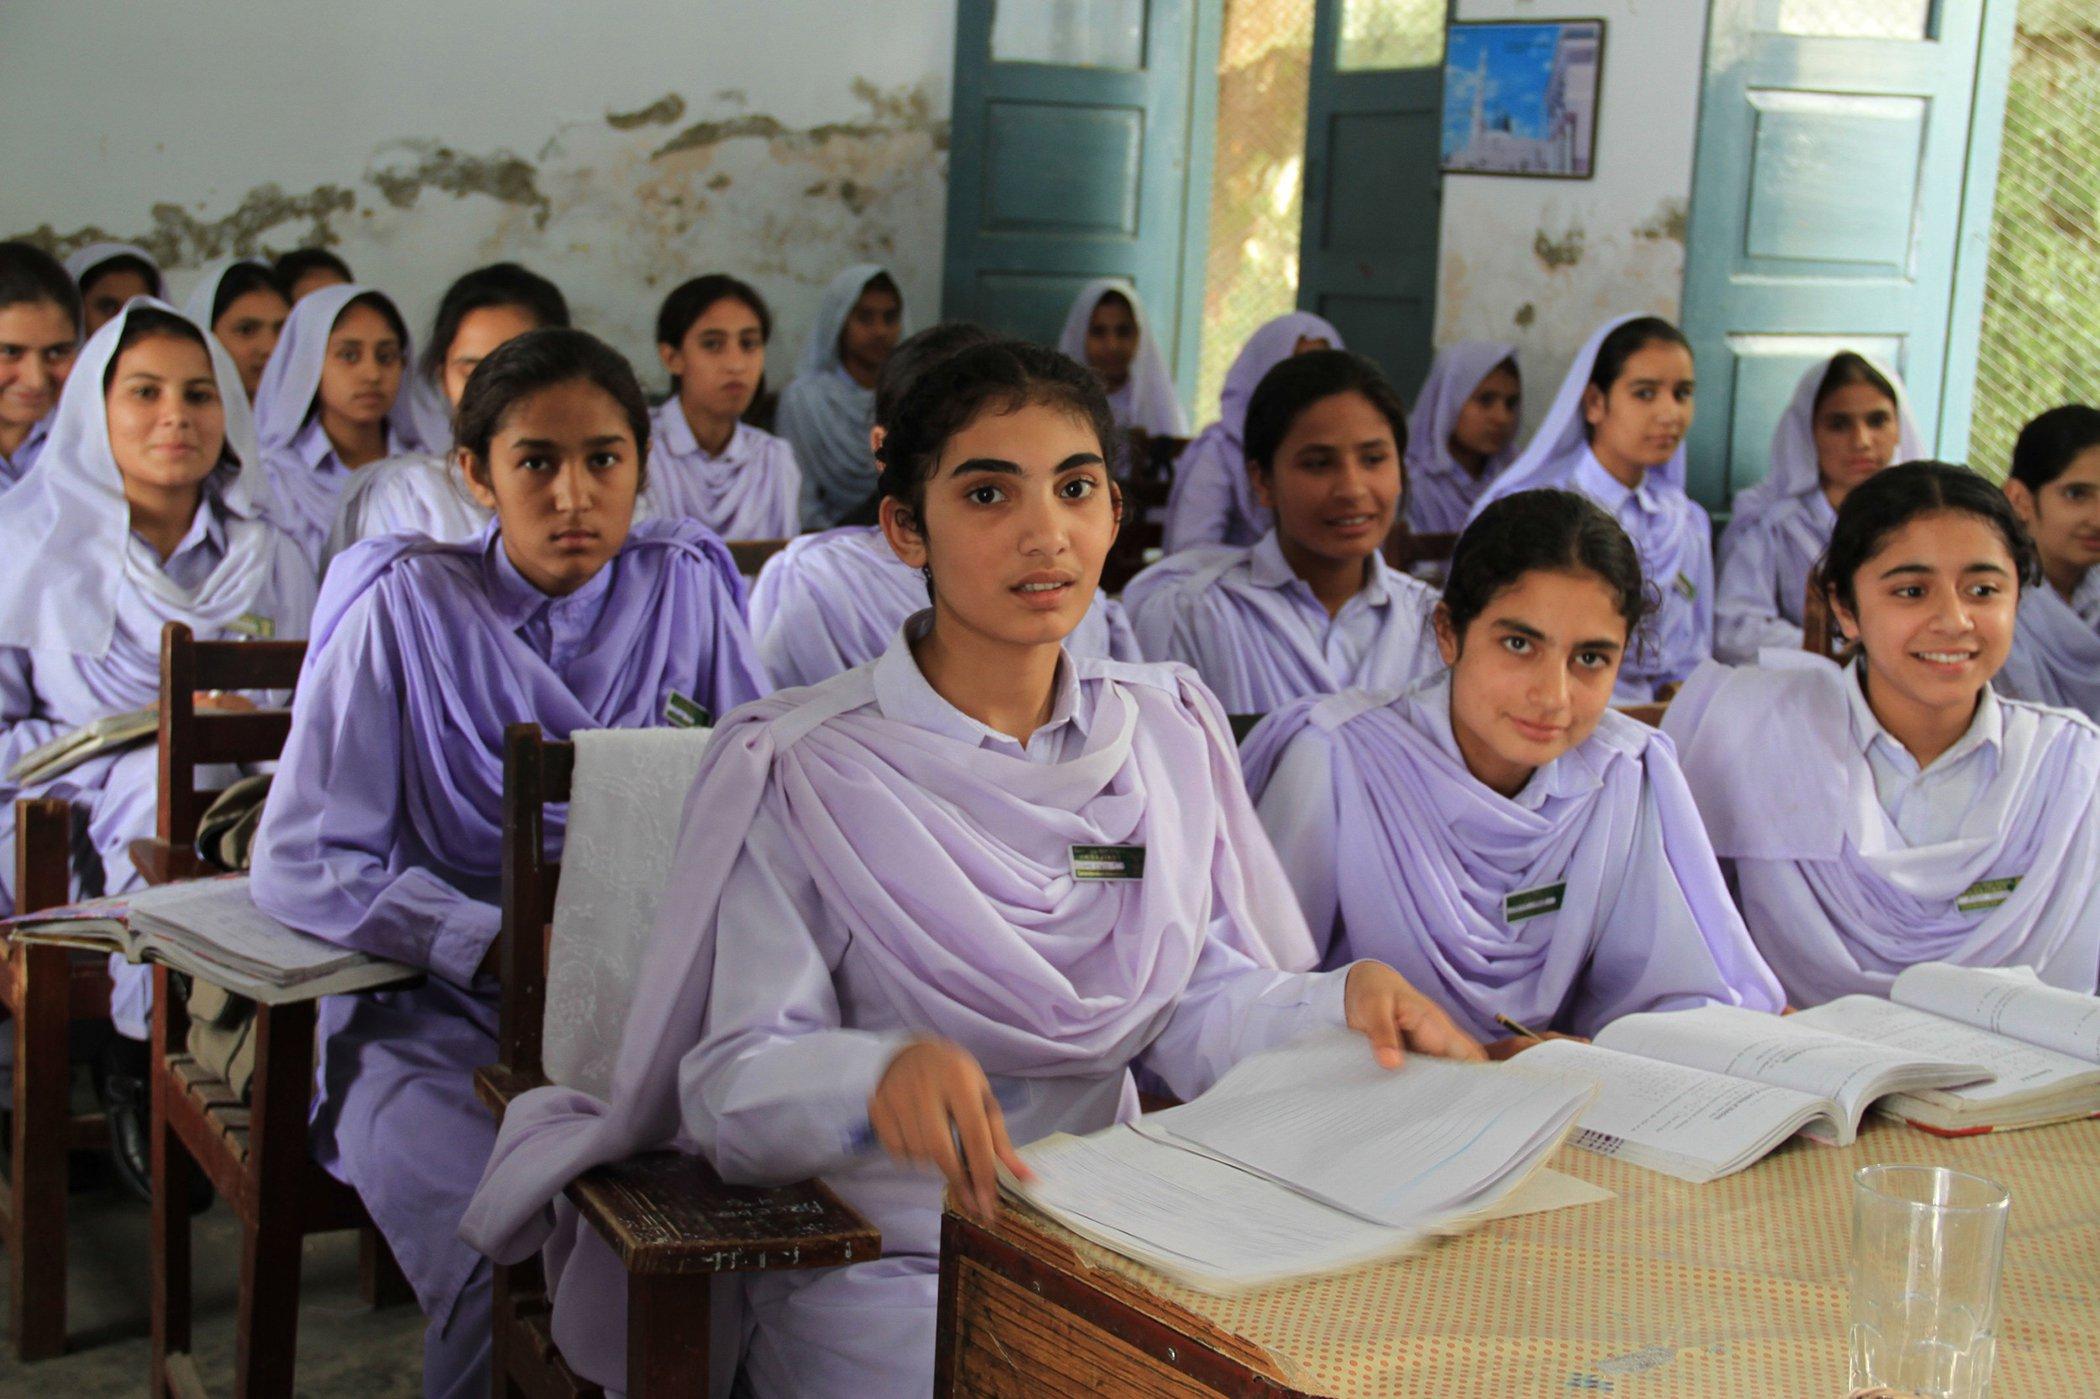 EducationAroundTheWorld_Pakistan_009.jpg